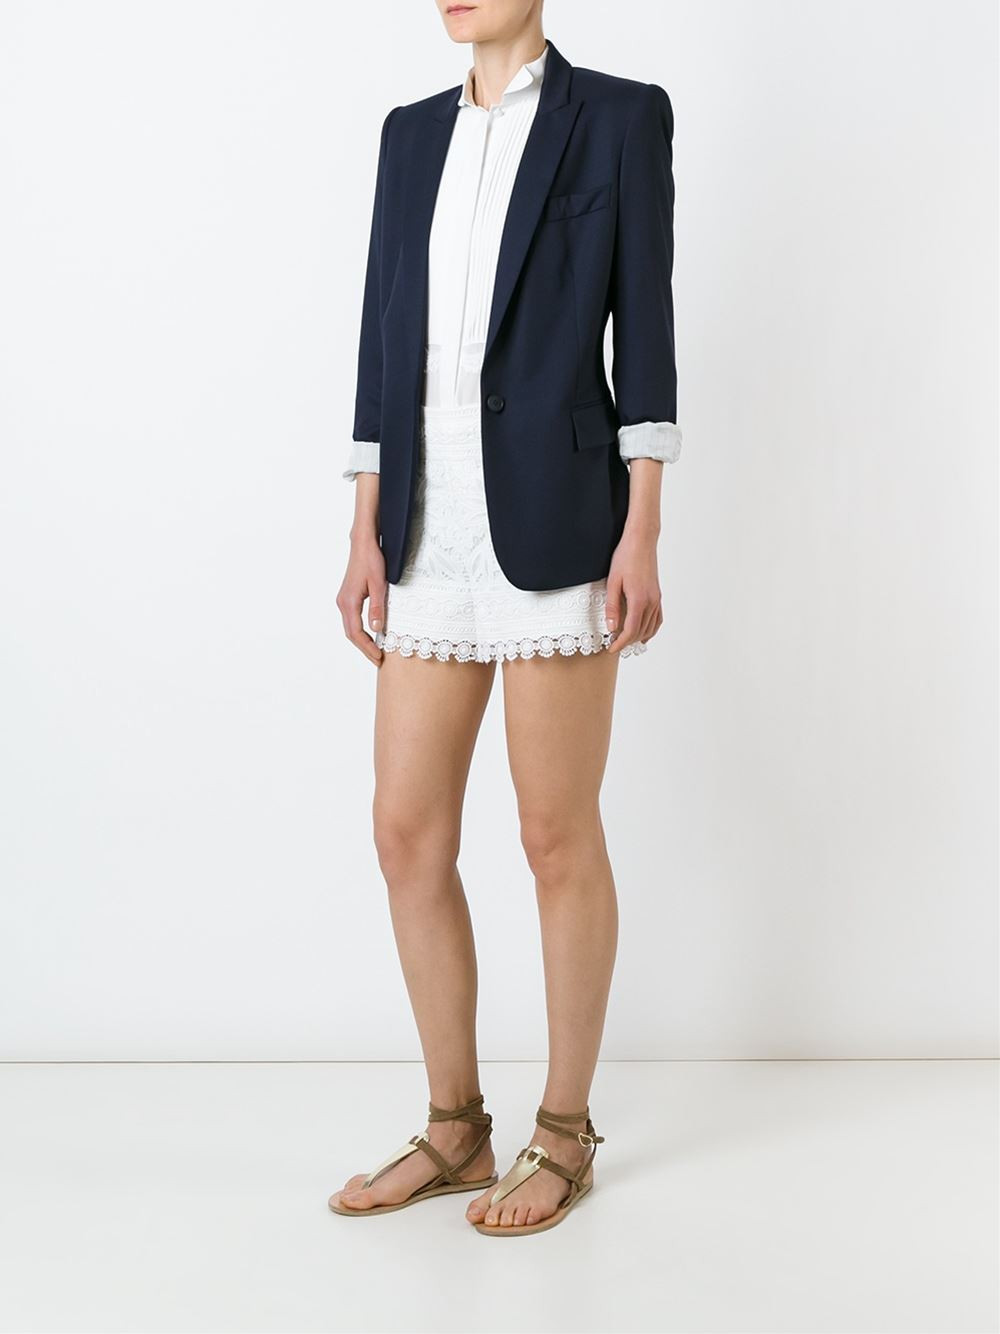 Tory Burch macramé lace shorts $293.12